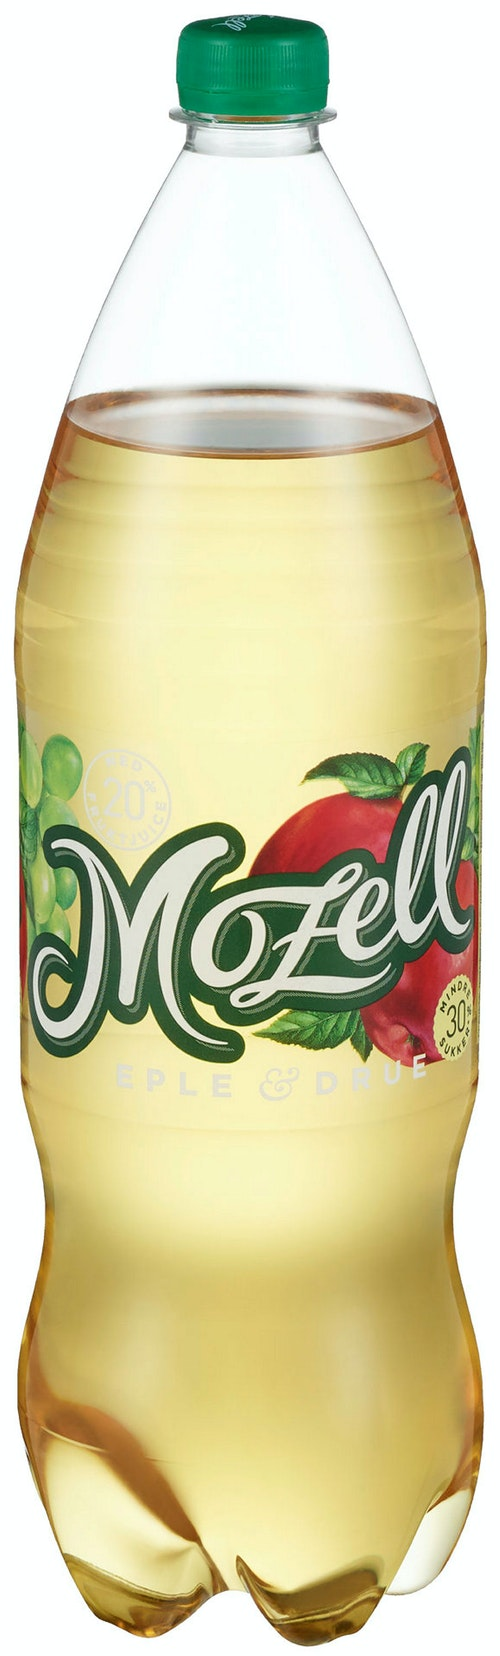 Ringnes Mozell Eple & Drue 1,5 l